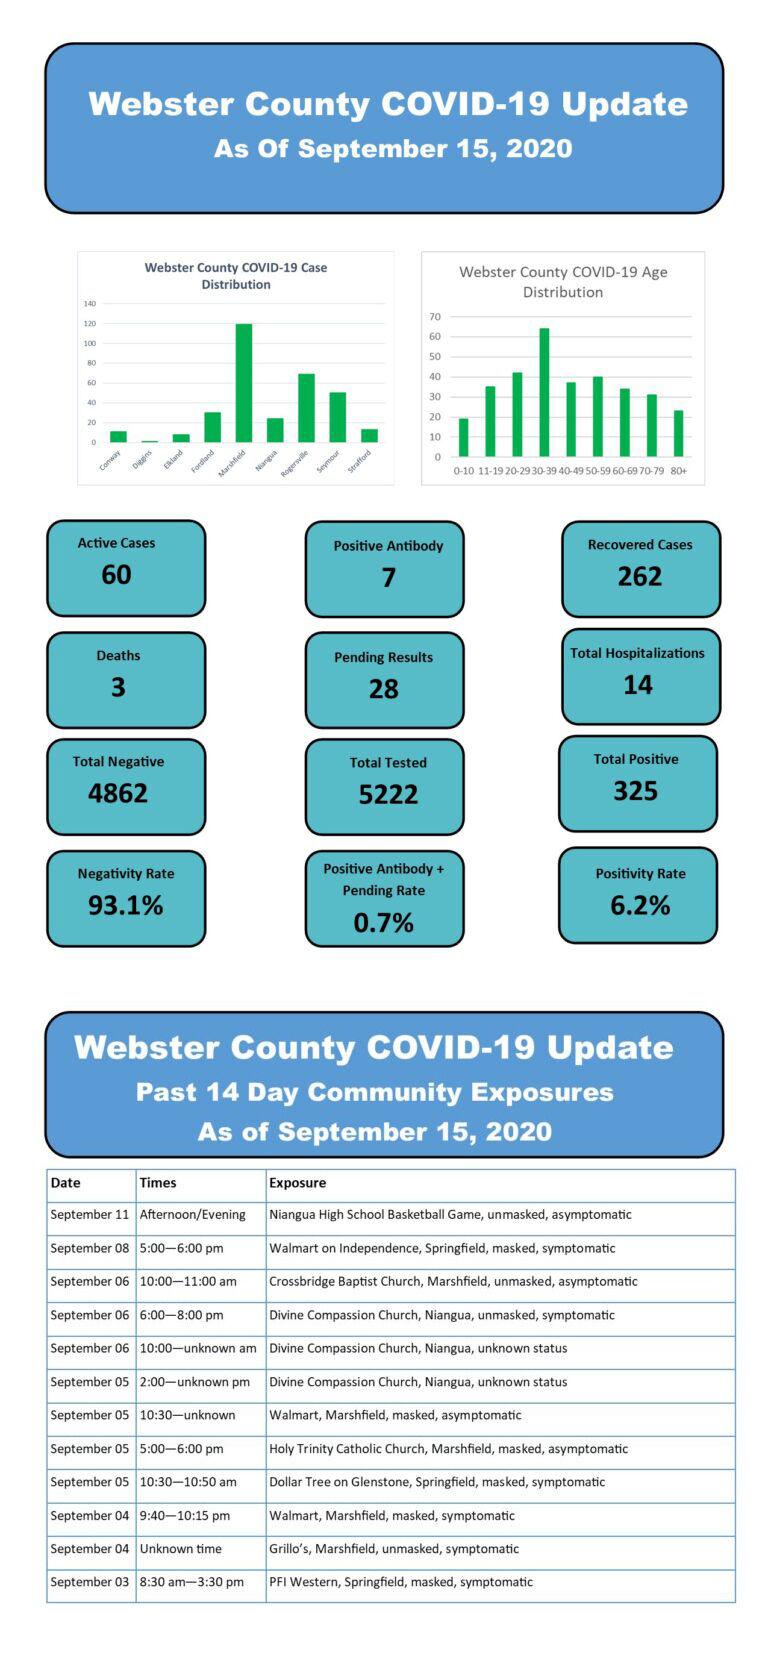 - COVID-19 cases Sept. 15 Web. Co.